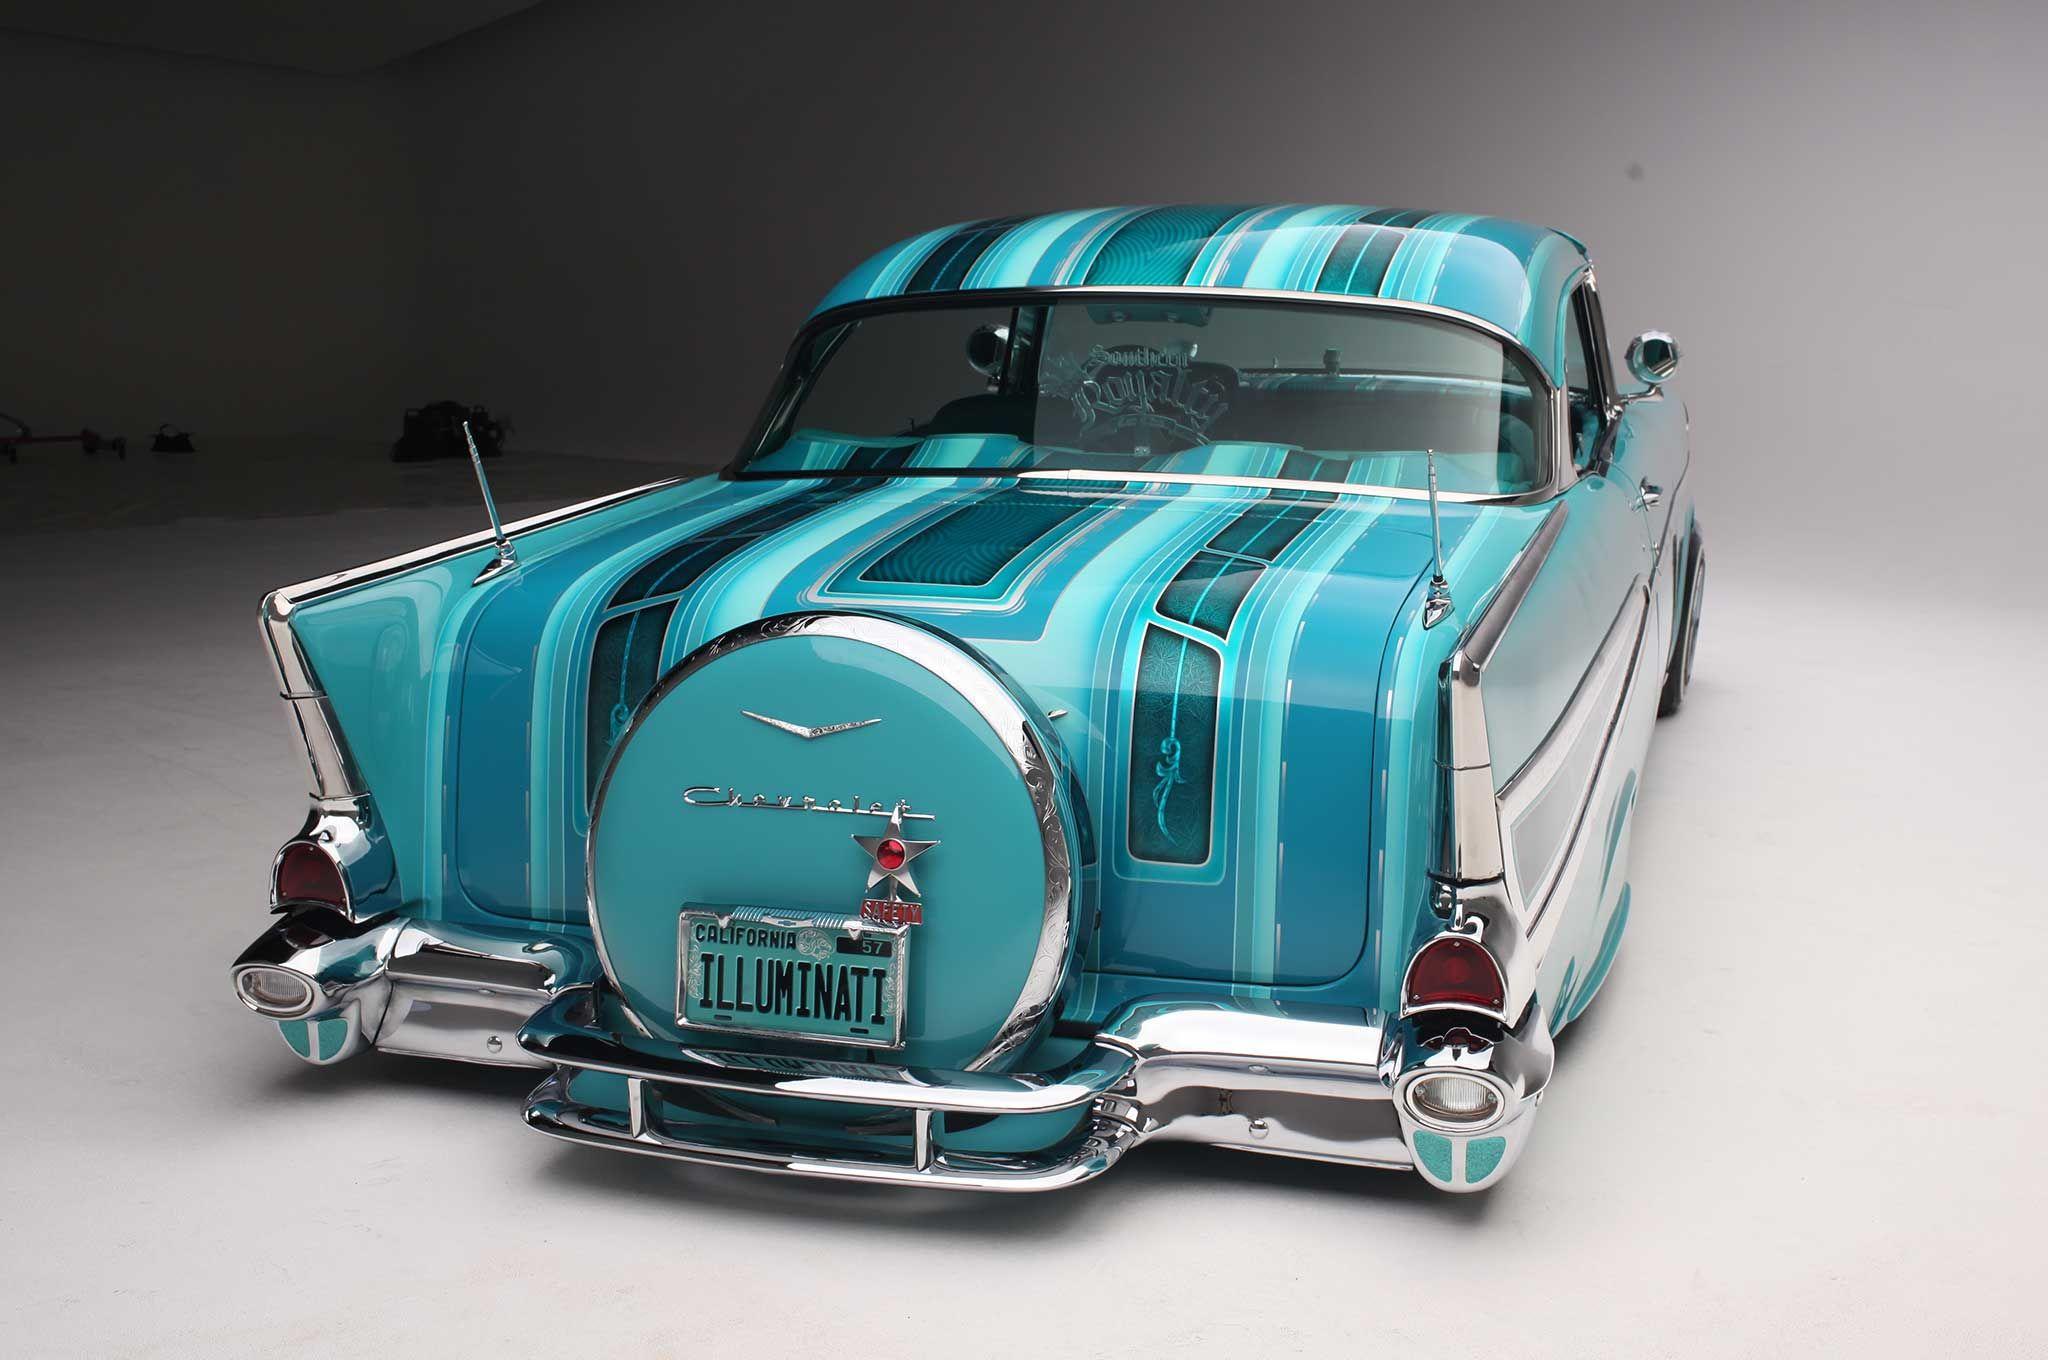 1957 Chevrolet Bel Air Modern Day Monarch Chevrolet Bel Air 1957 Chevrolet 57 Chevy Bel Air